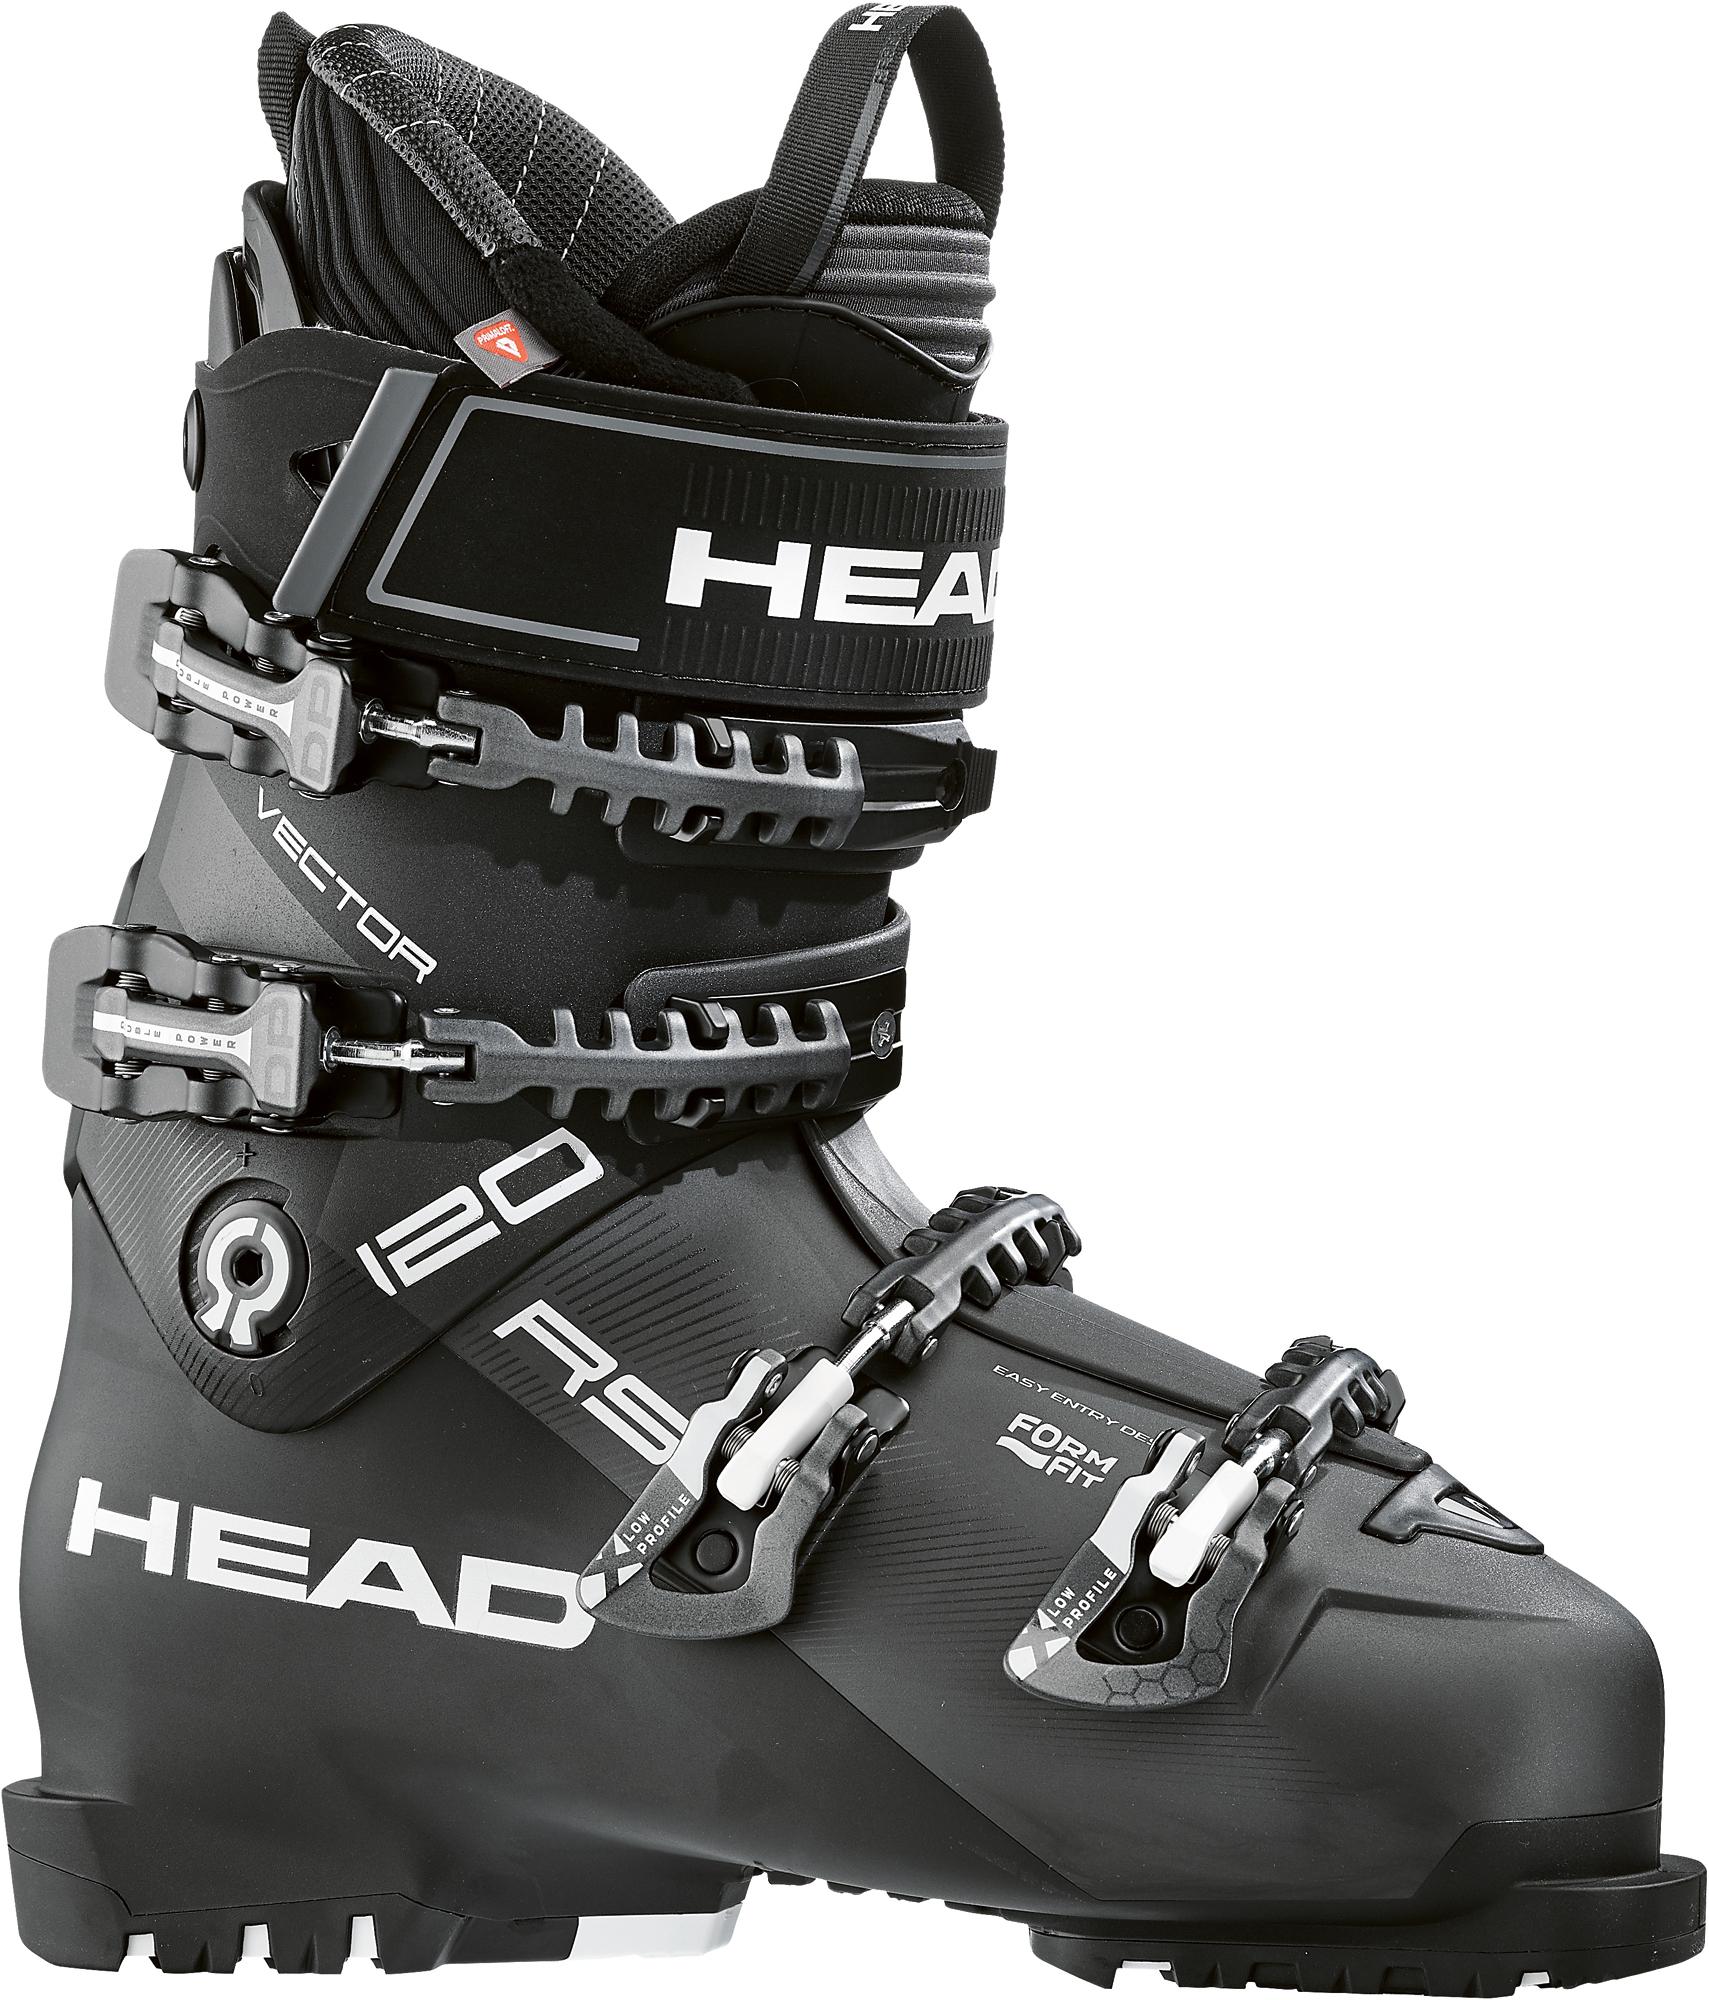 Head Ботинки горнолыжные VECTOR RS 120S, размер 29,5 см